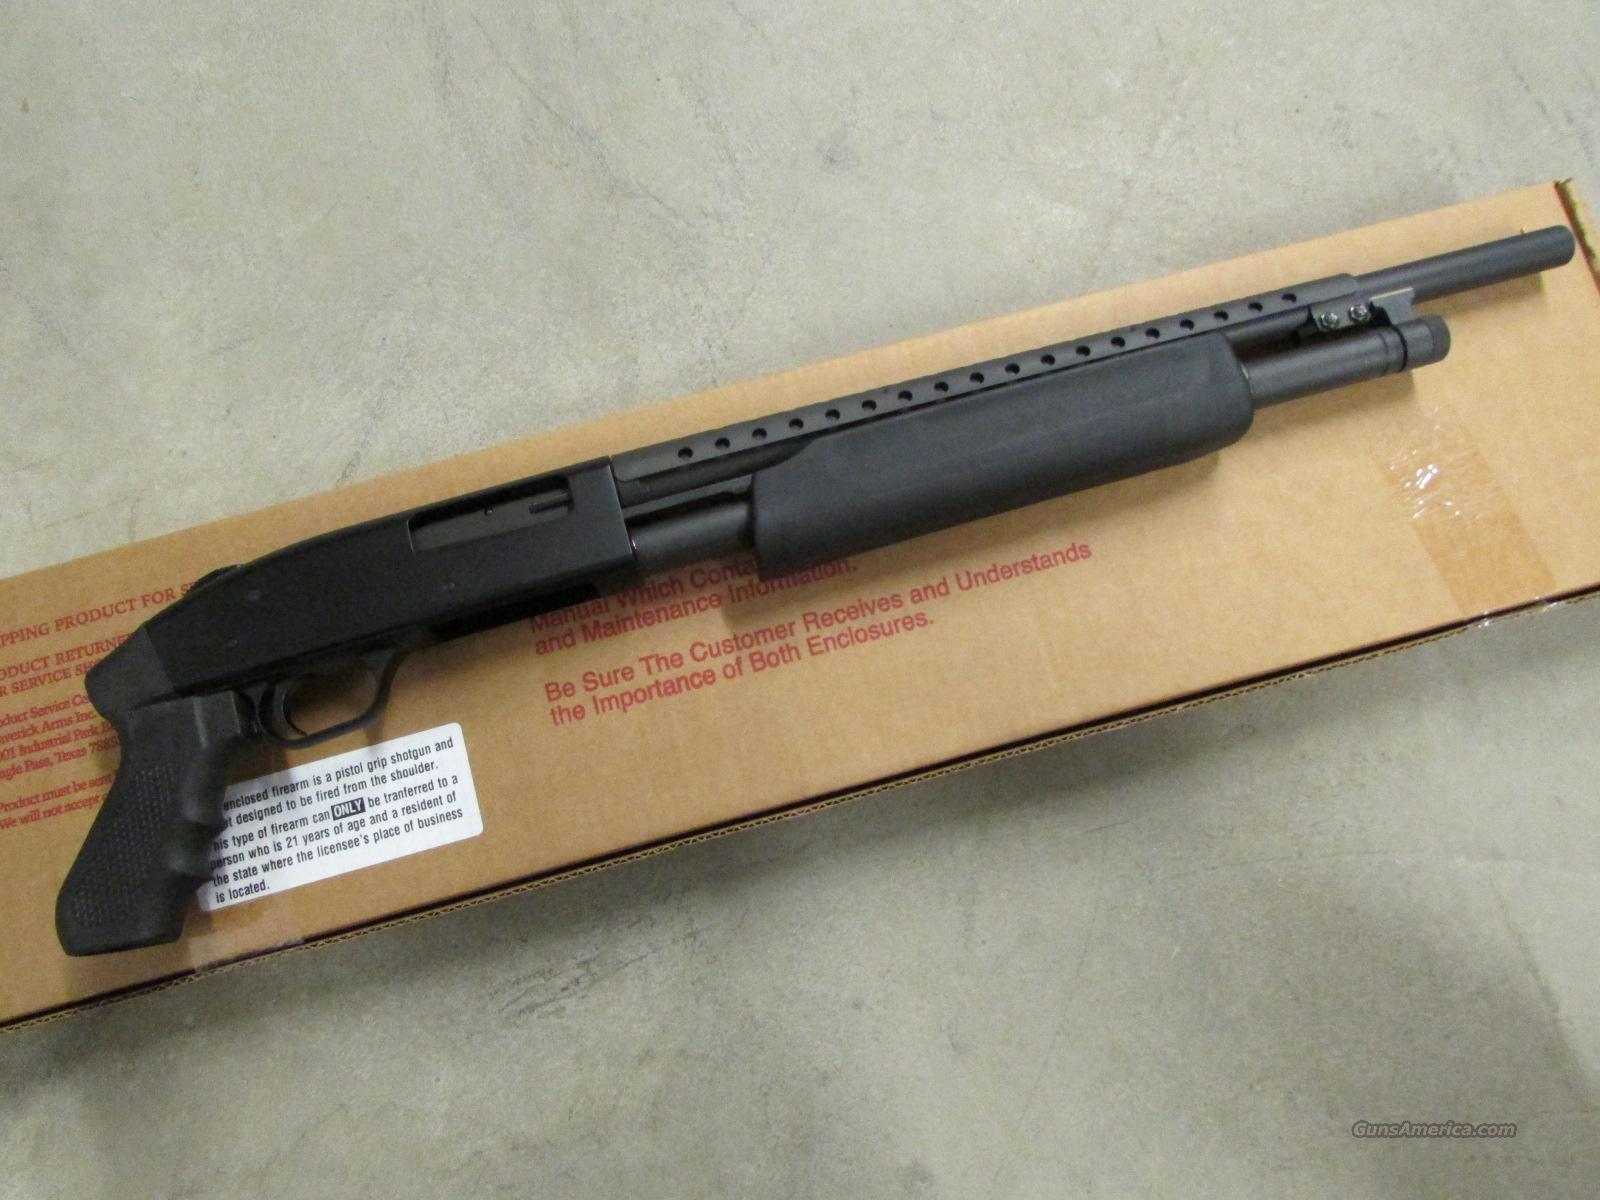 Mossberg pistol grip 20 gauge shotguns